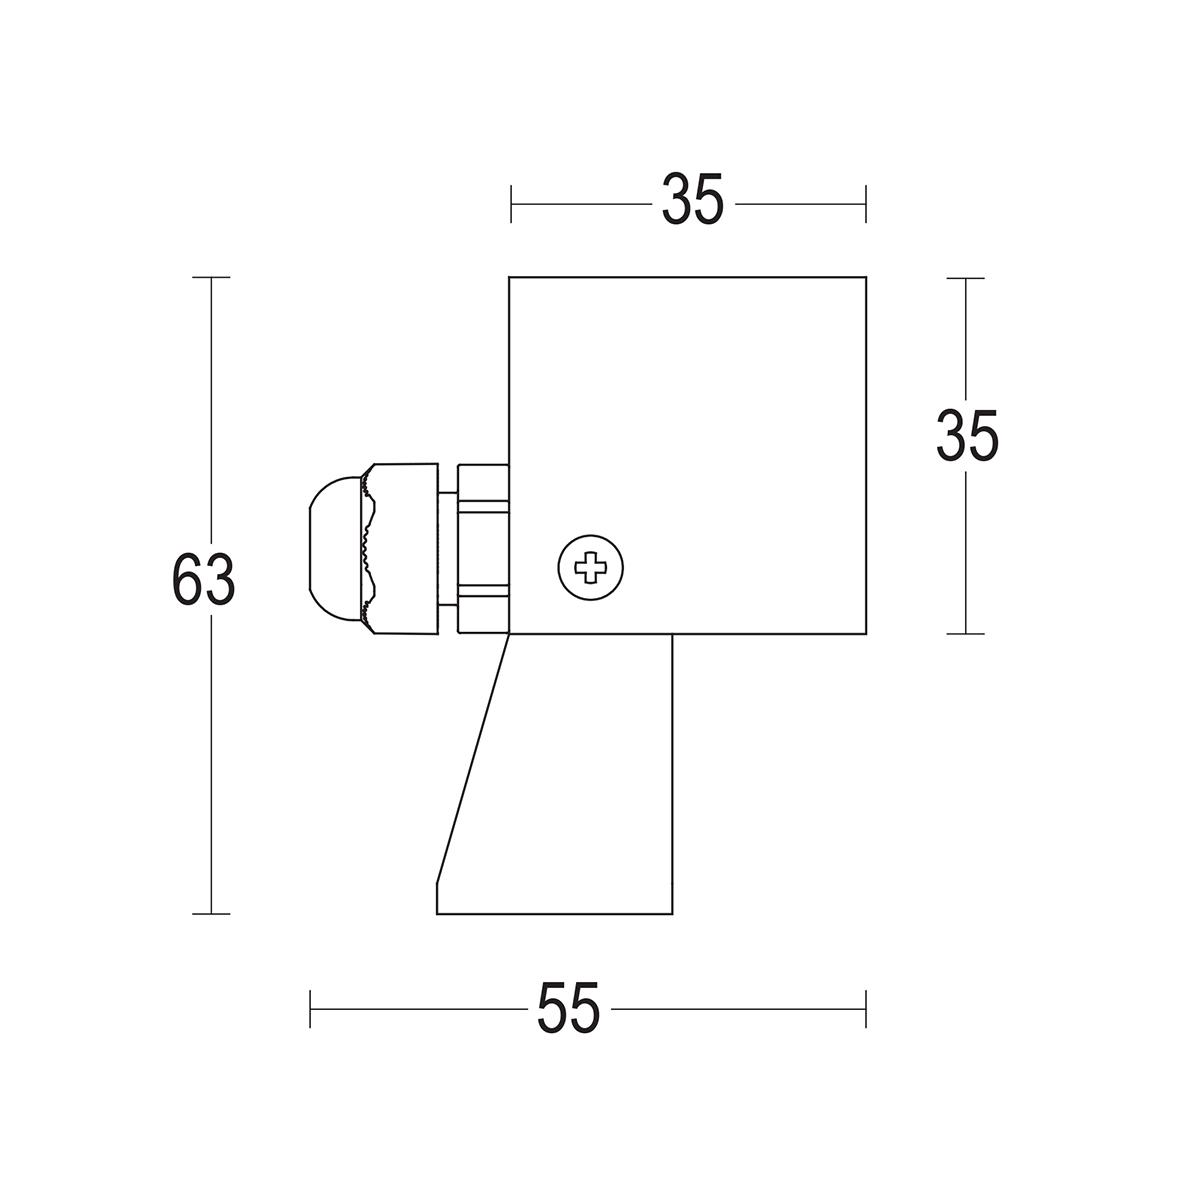 чертеж Segno spot 35 Ghidini уличный светильник GH1127.BAST300EC